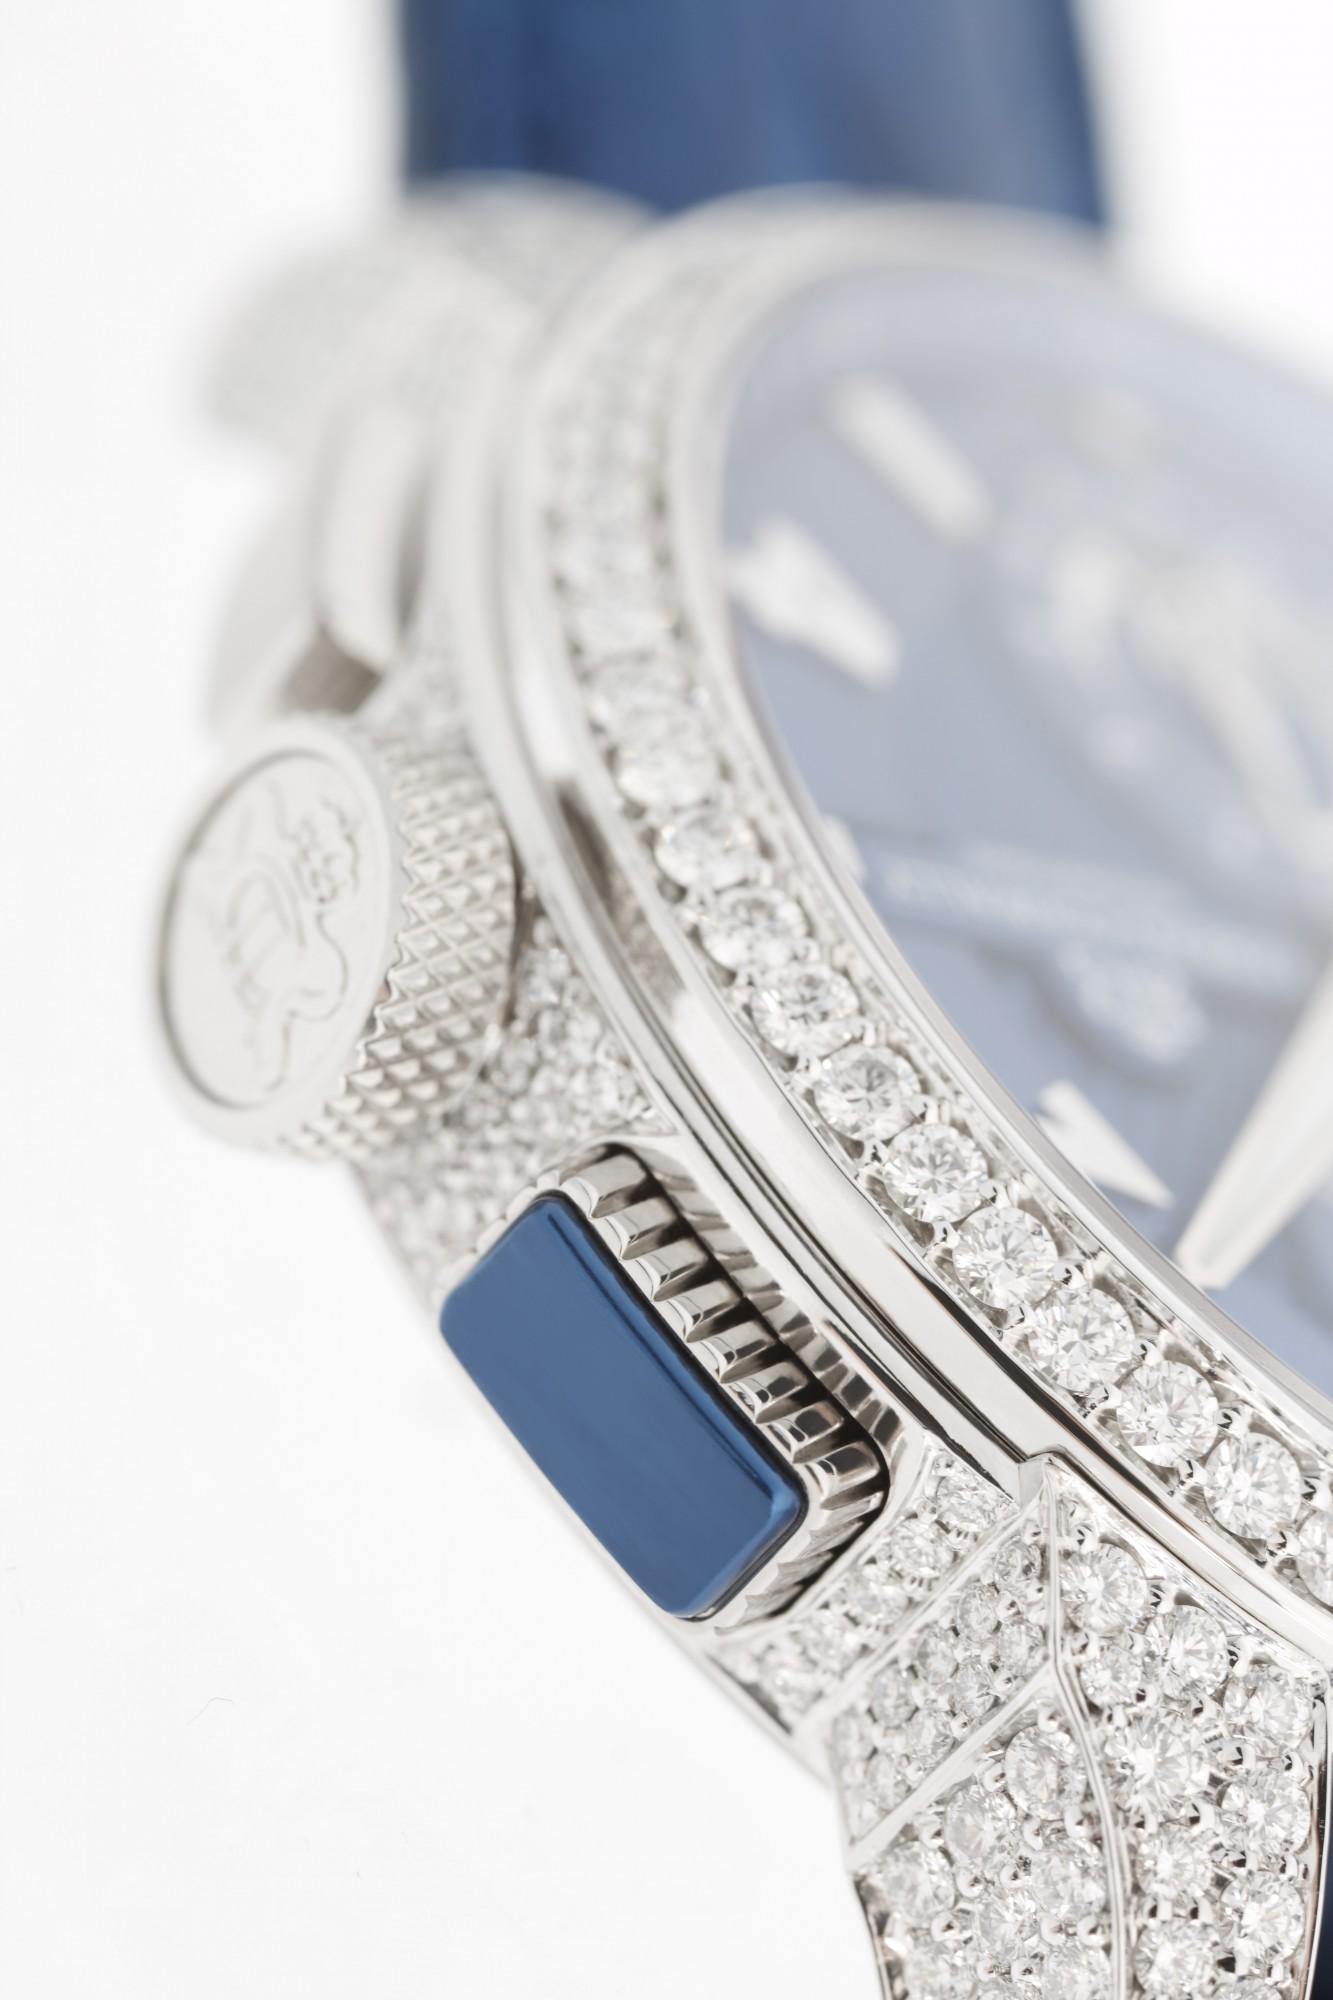 11-12-lebeau -diamonds03239 copy